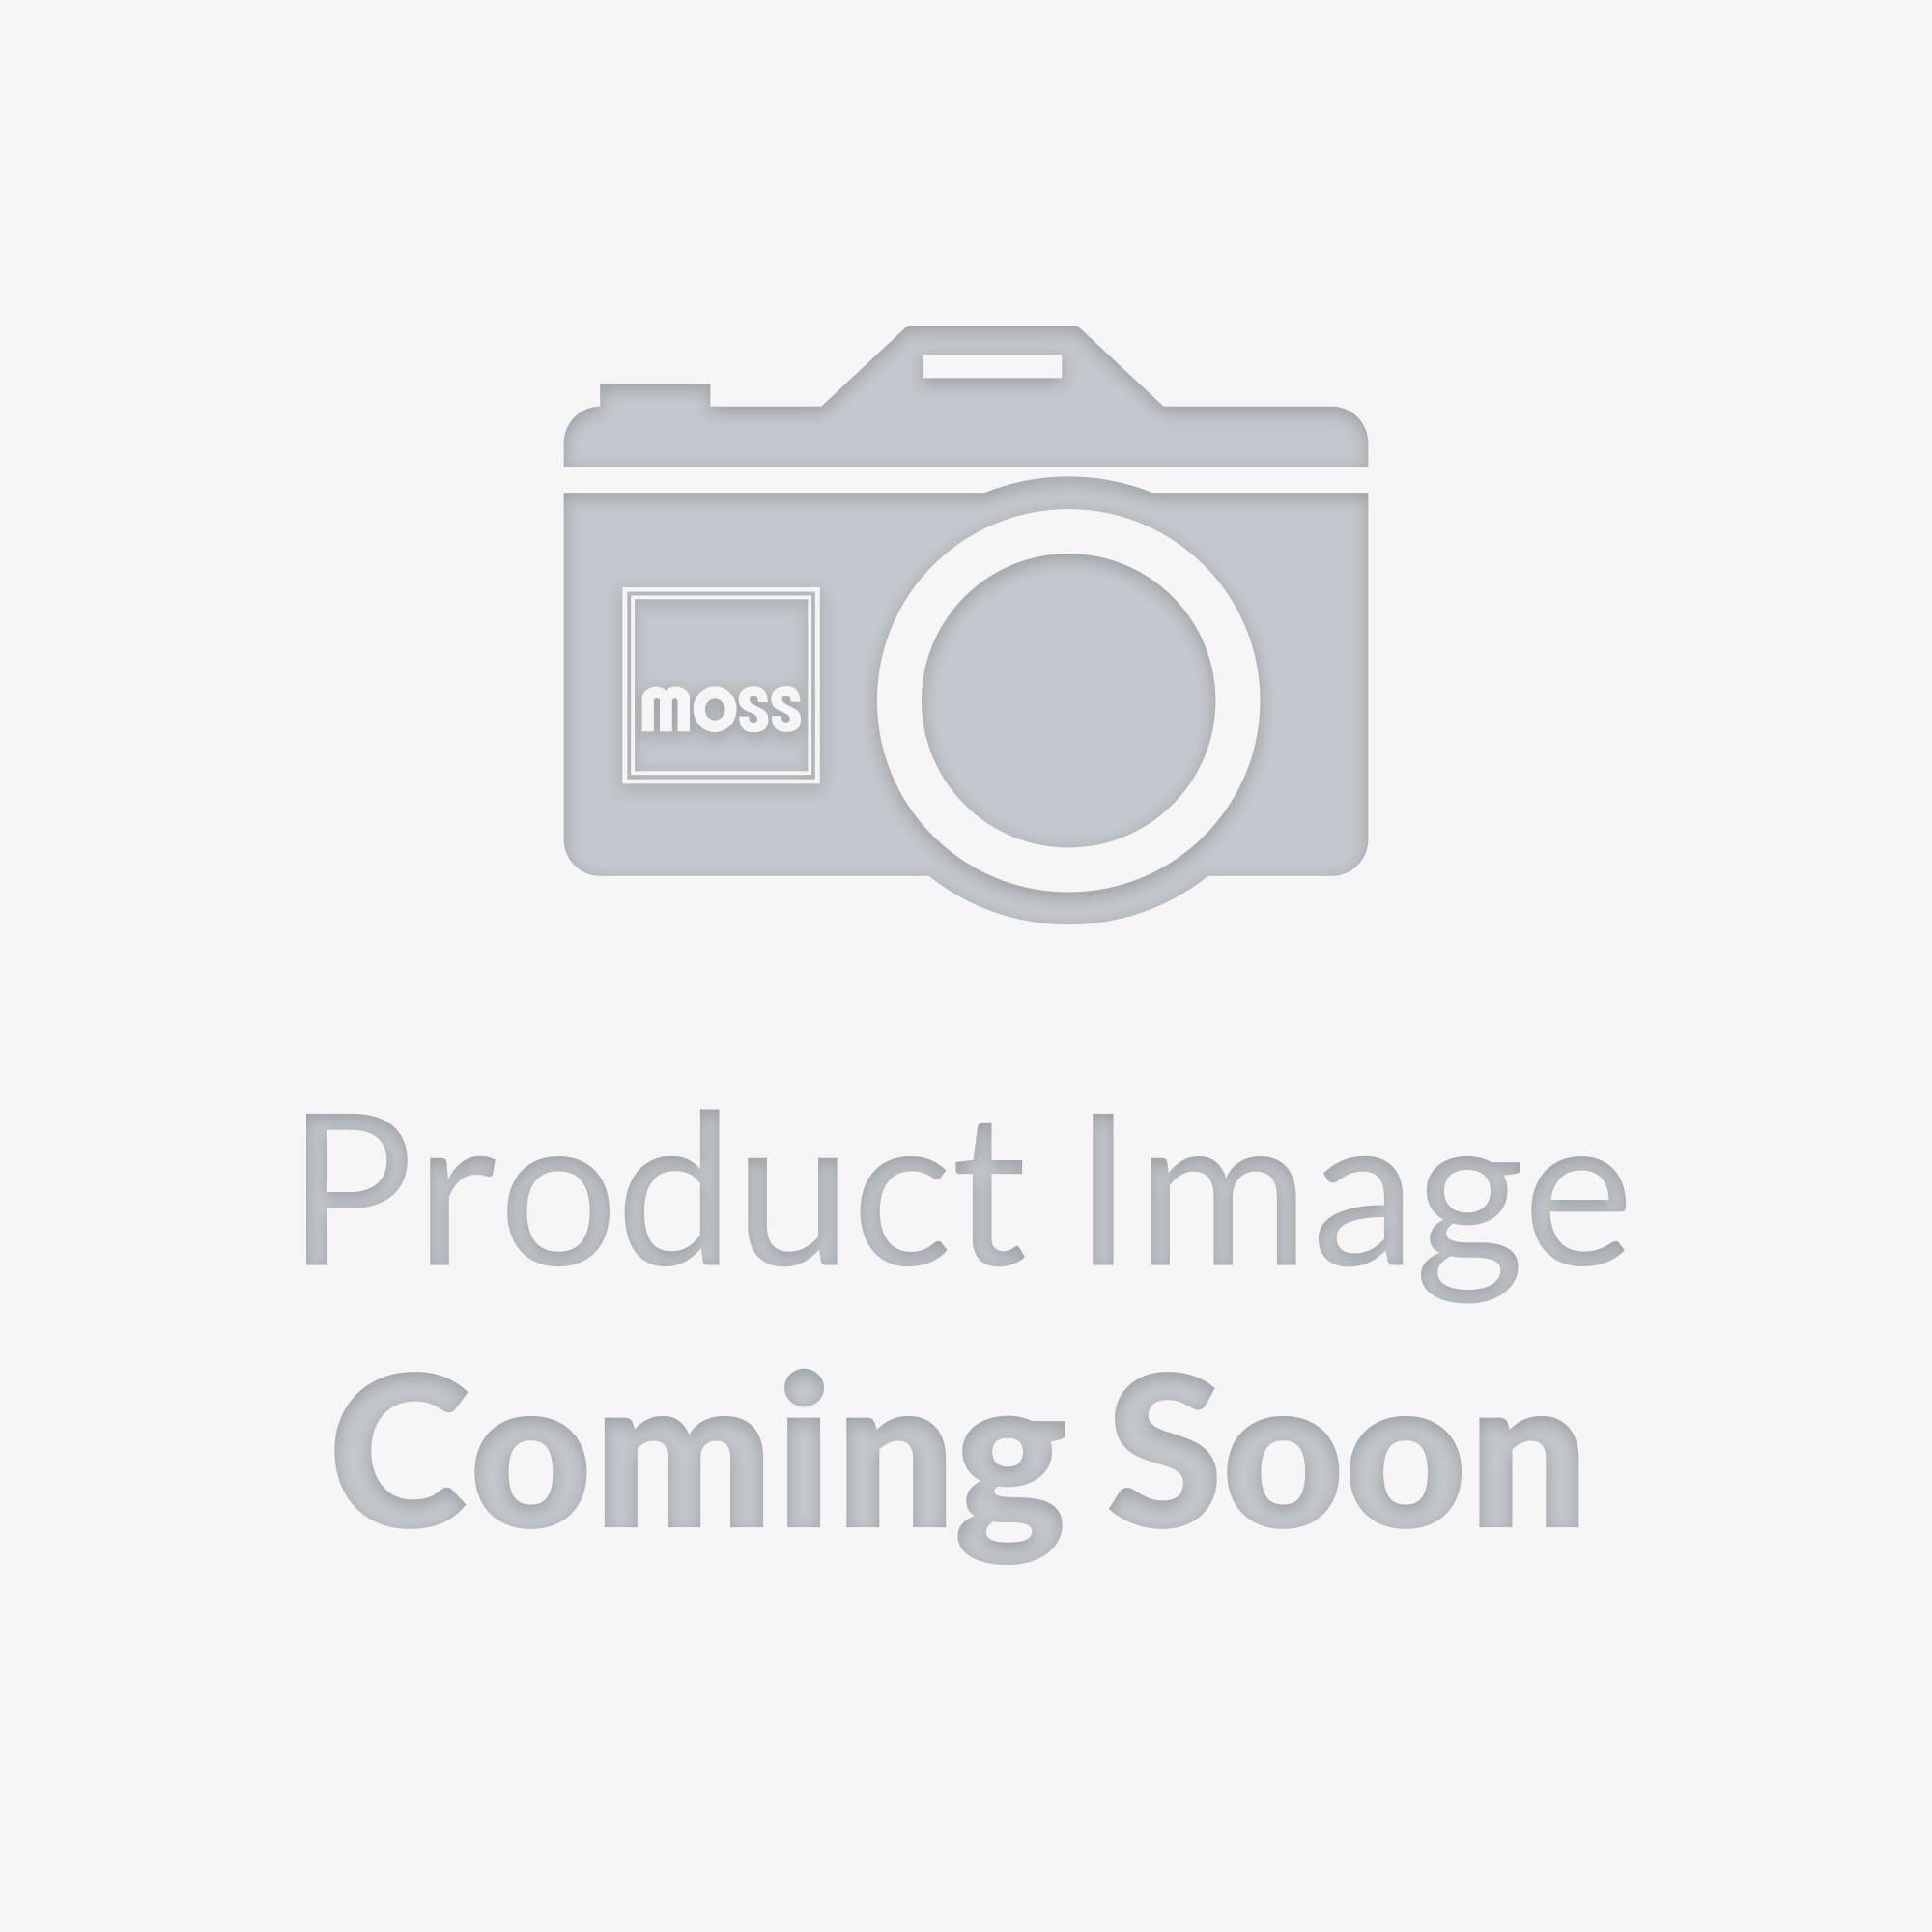 Angled Gas HOSE for filler neck to tank Mgb SPM